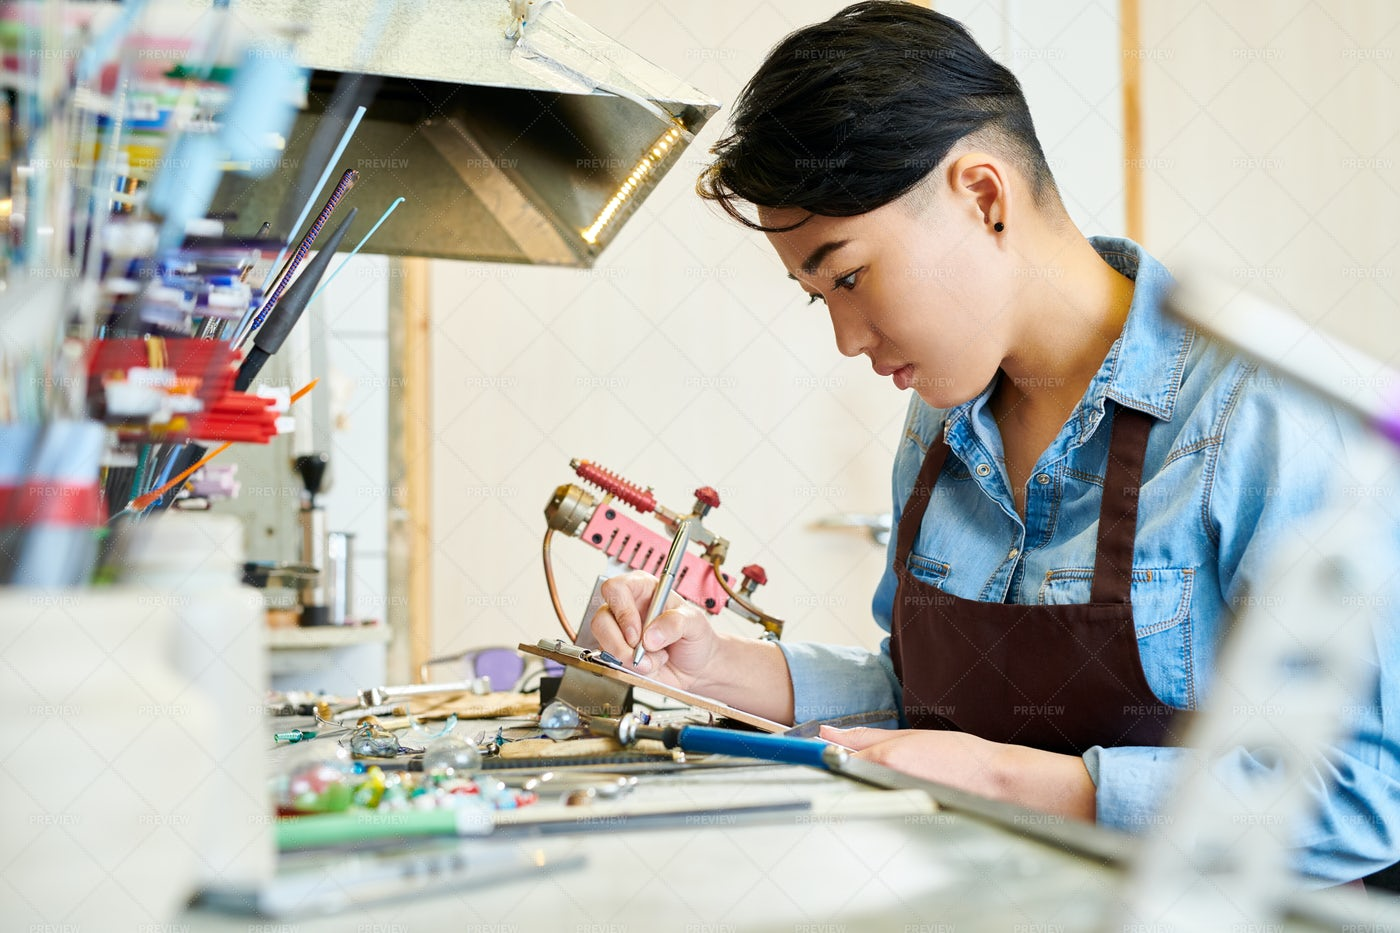 Asian Woman In Glassworking Studio: Stock Photos